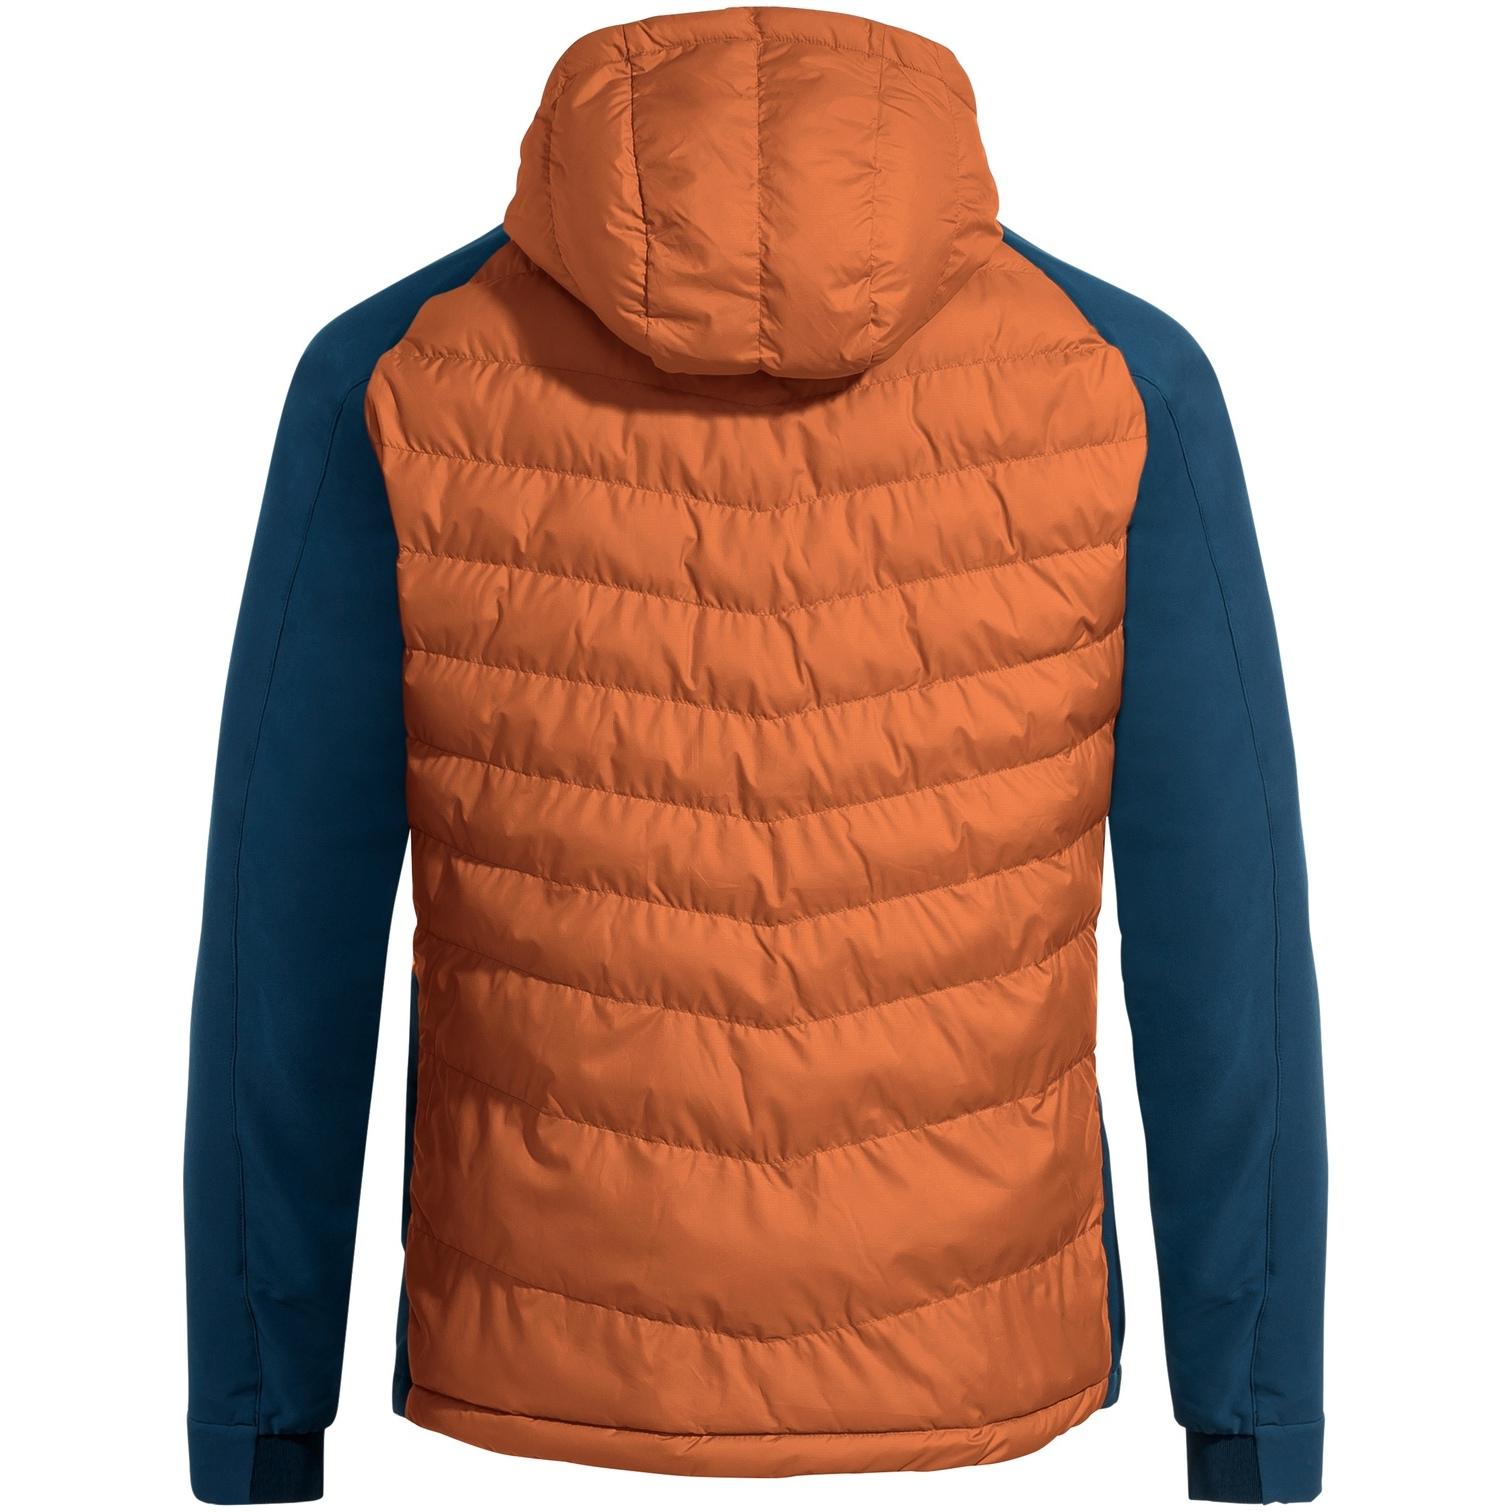 Image of Vaude Men's Elope Hybrid Jacket - terra